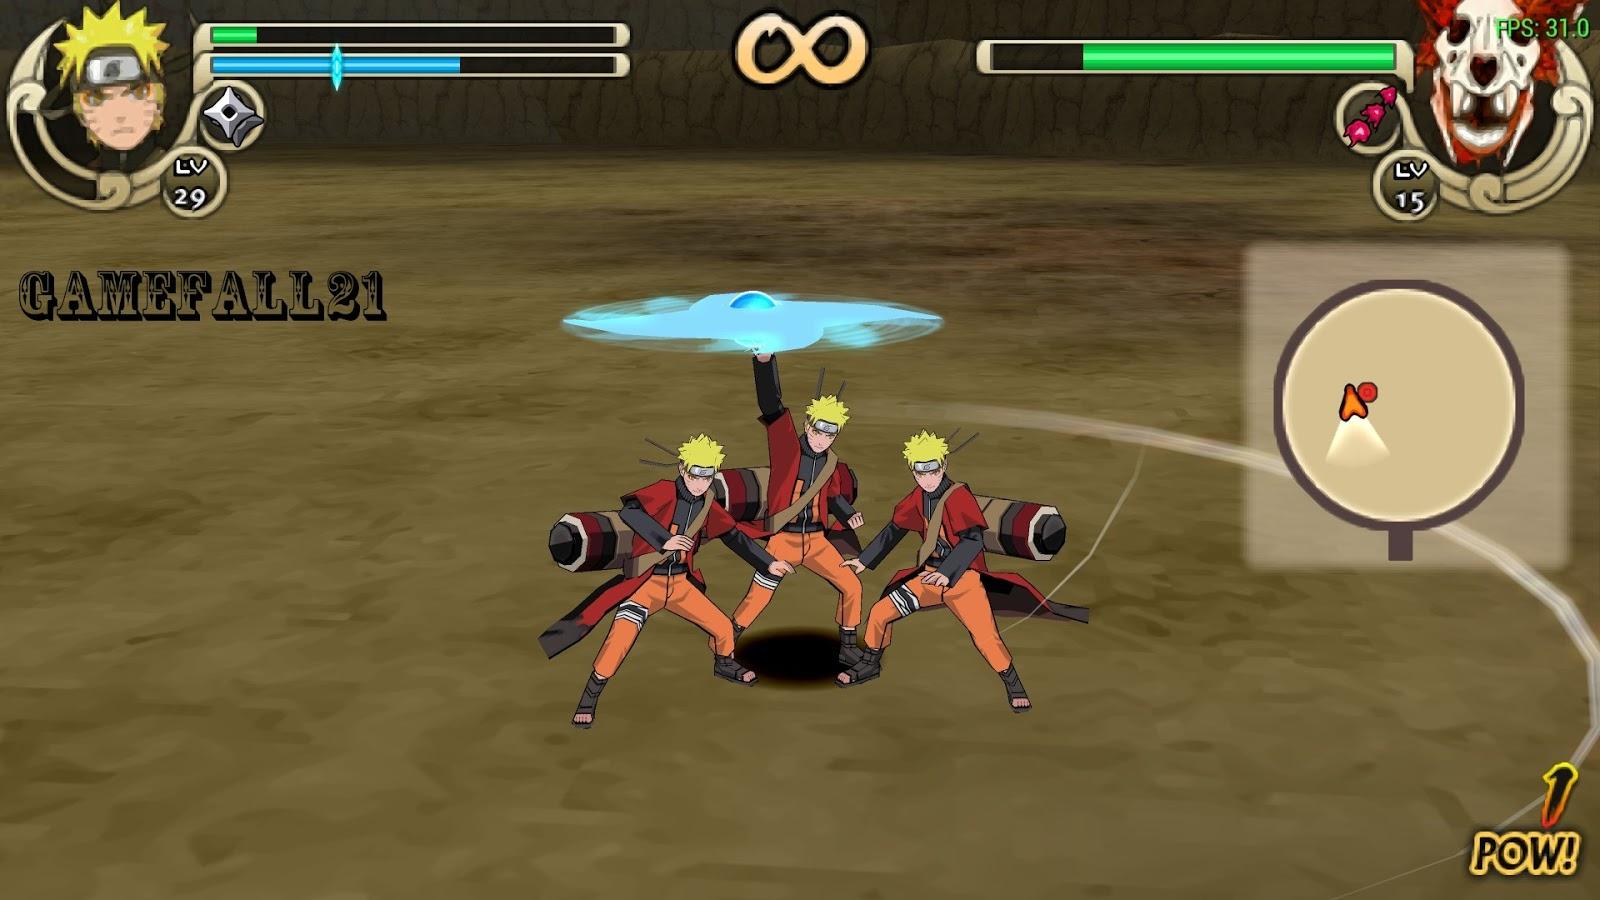 Naruto Shippuden Ultimate Ninja Impact PPSSPP v USA .iso Settings